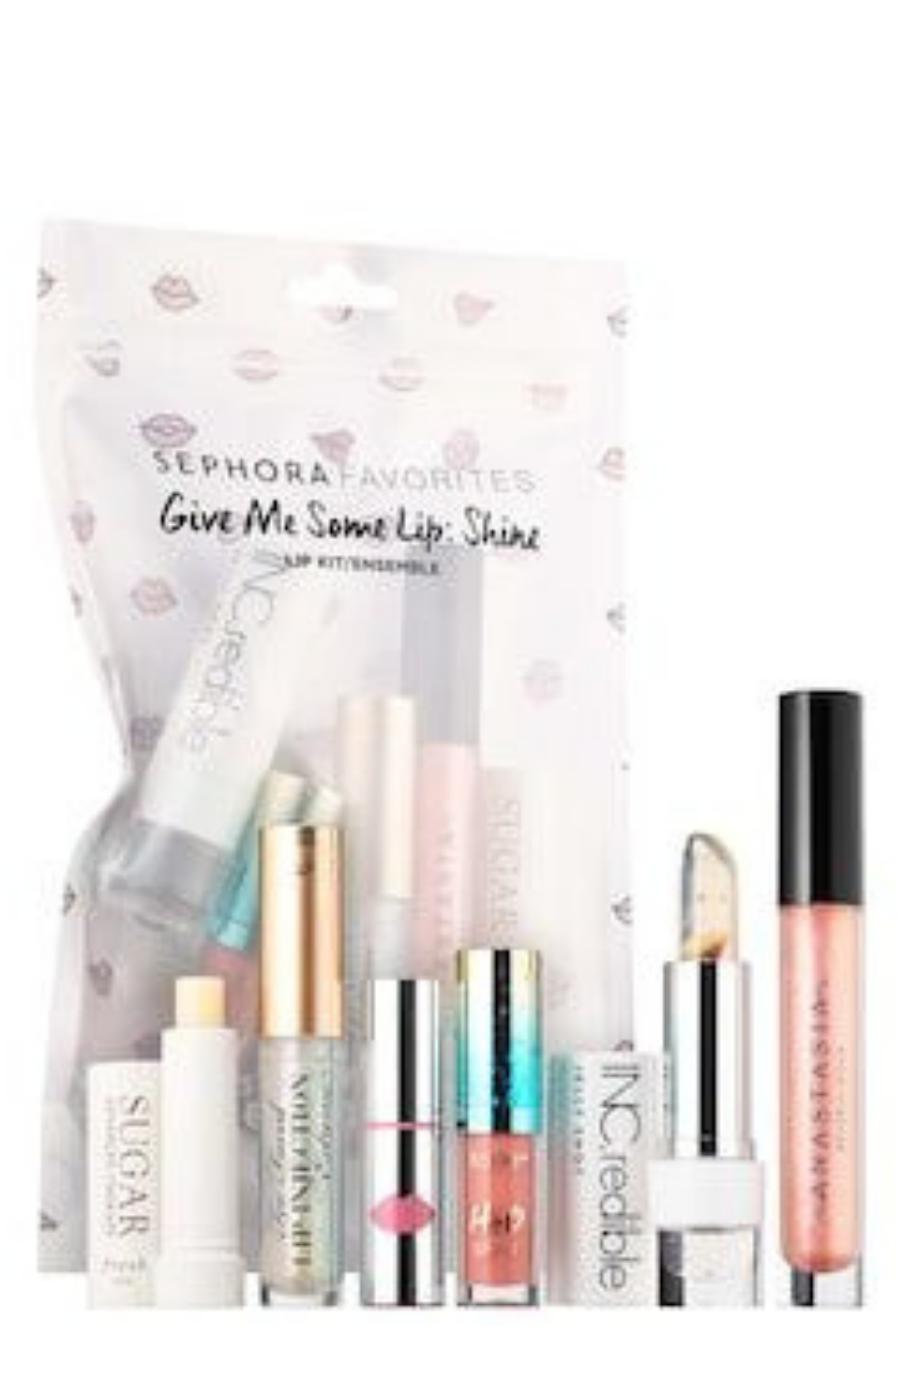 SEPHORA FAVORITES Give Me Some Shine Lip Set affiliate